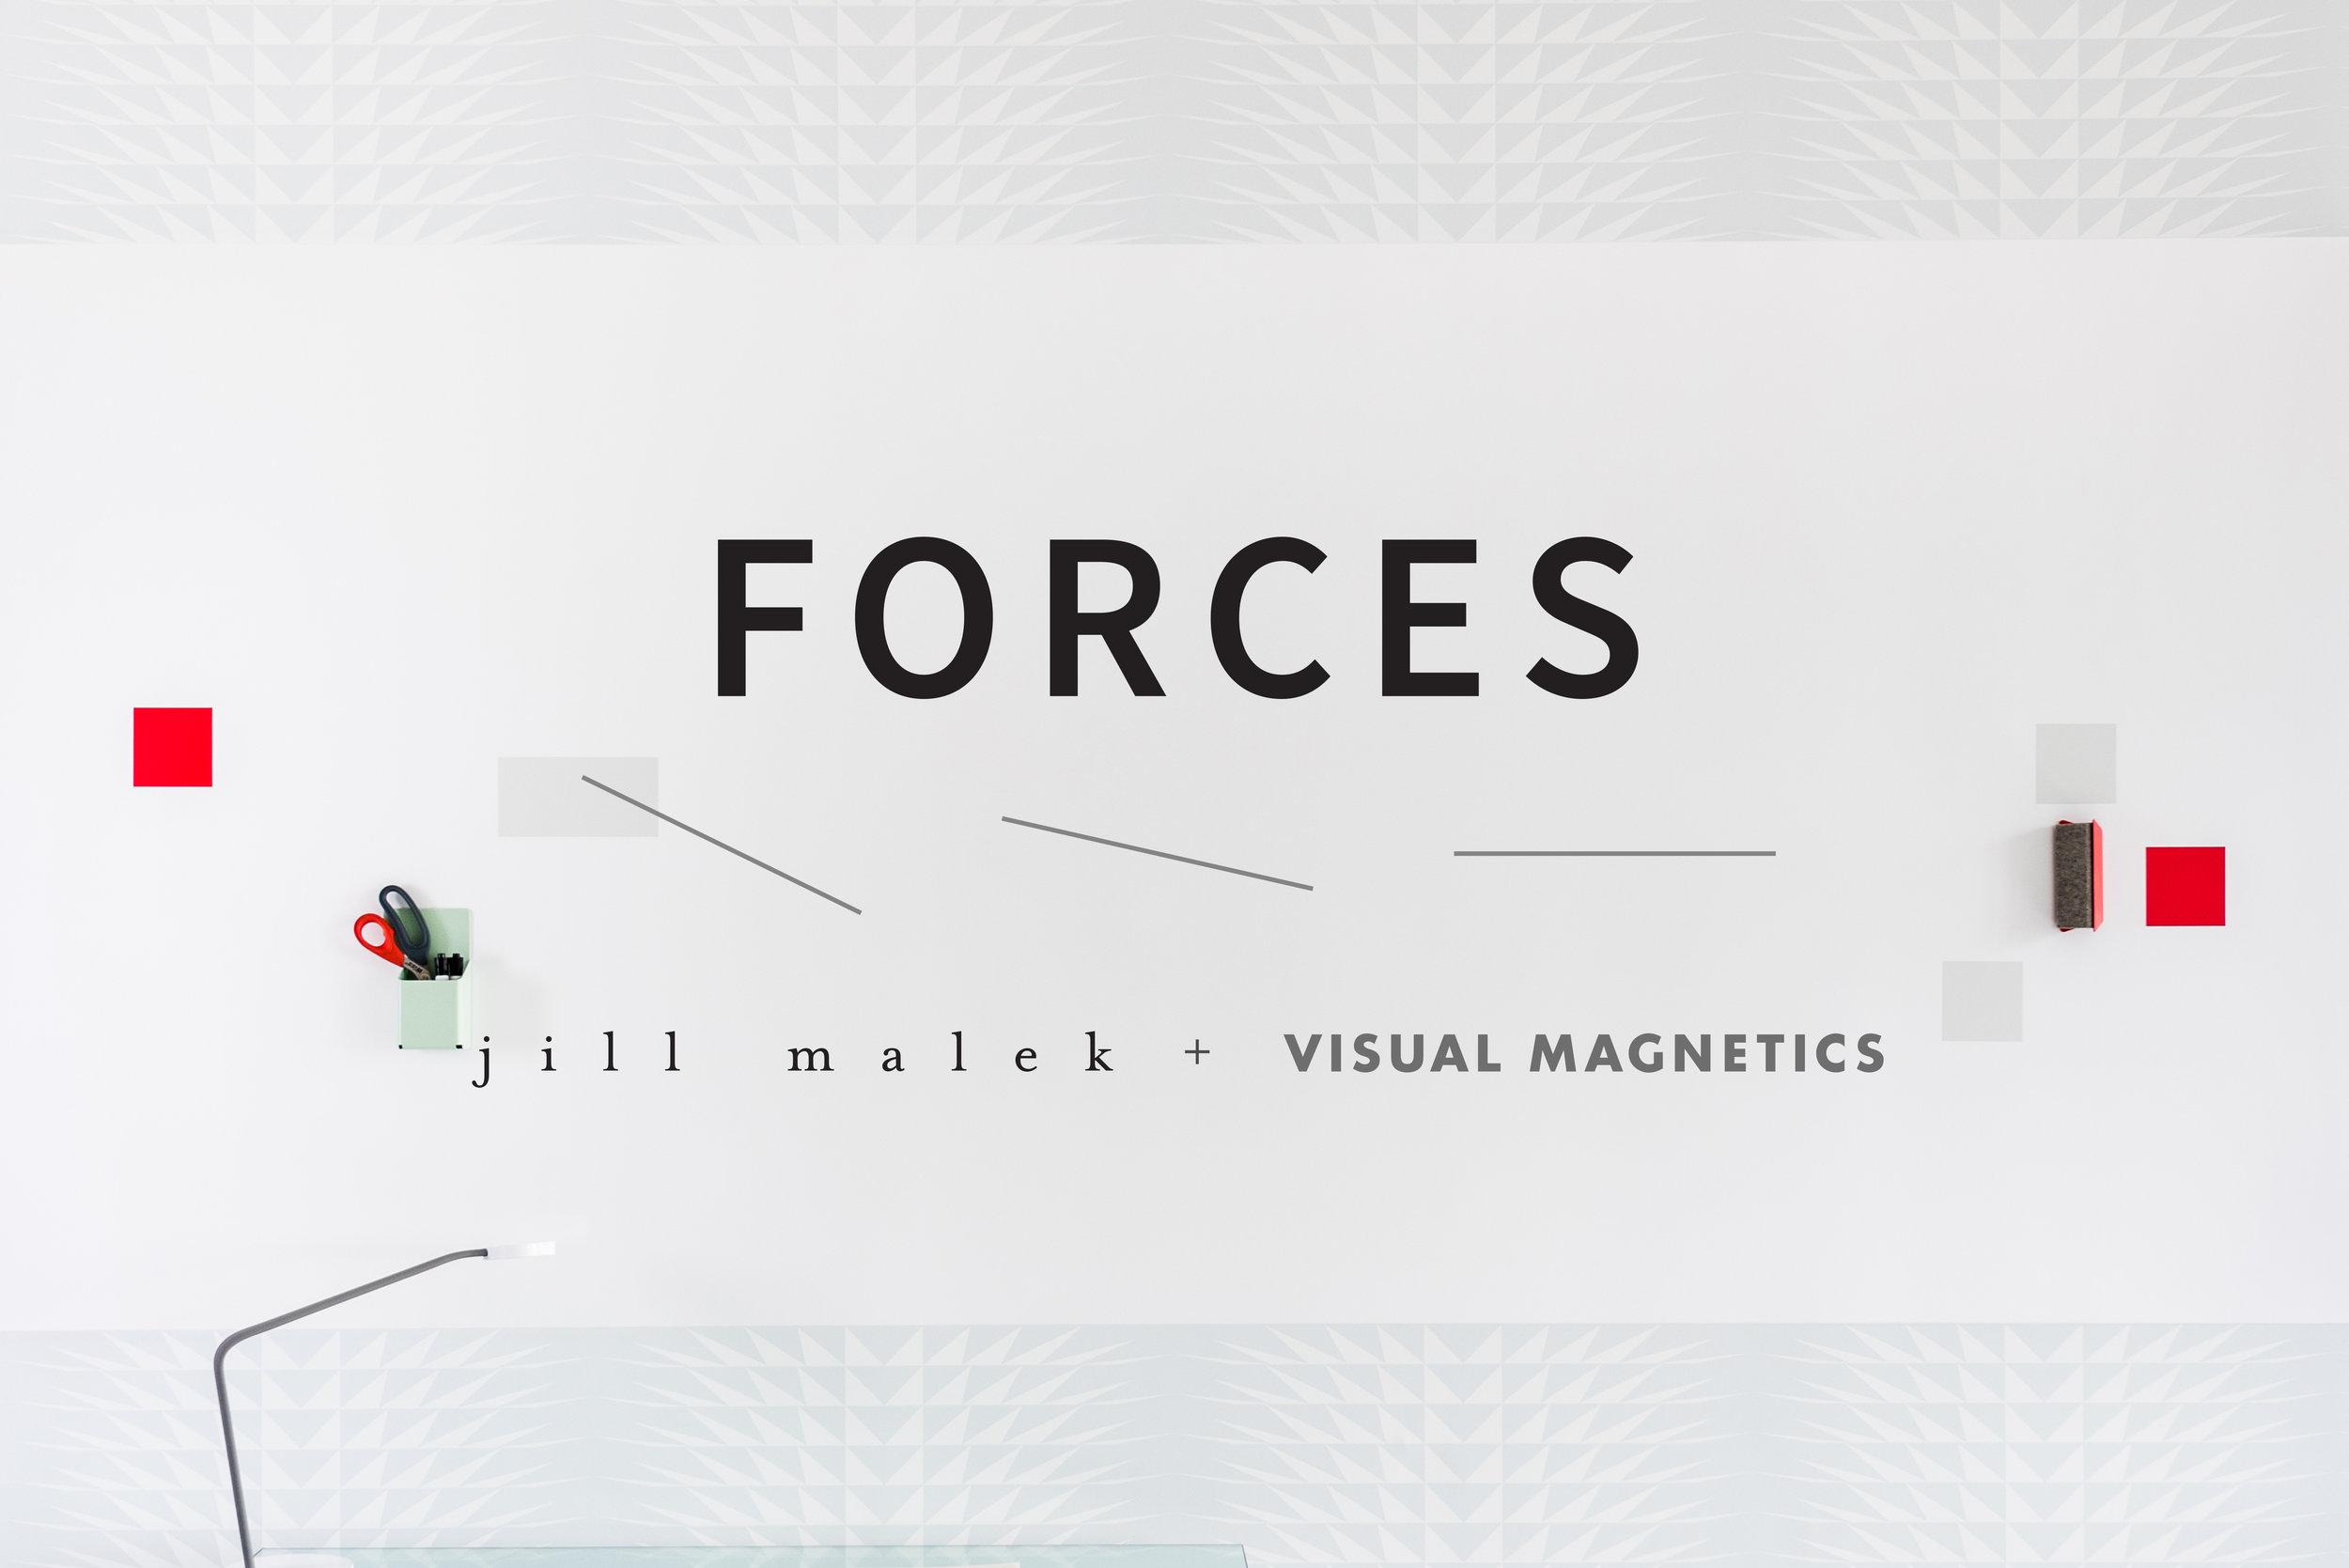 forceswlogo.jpg